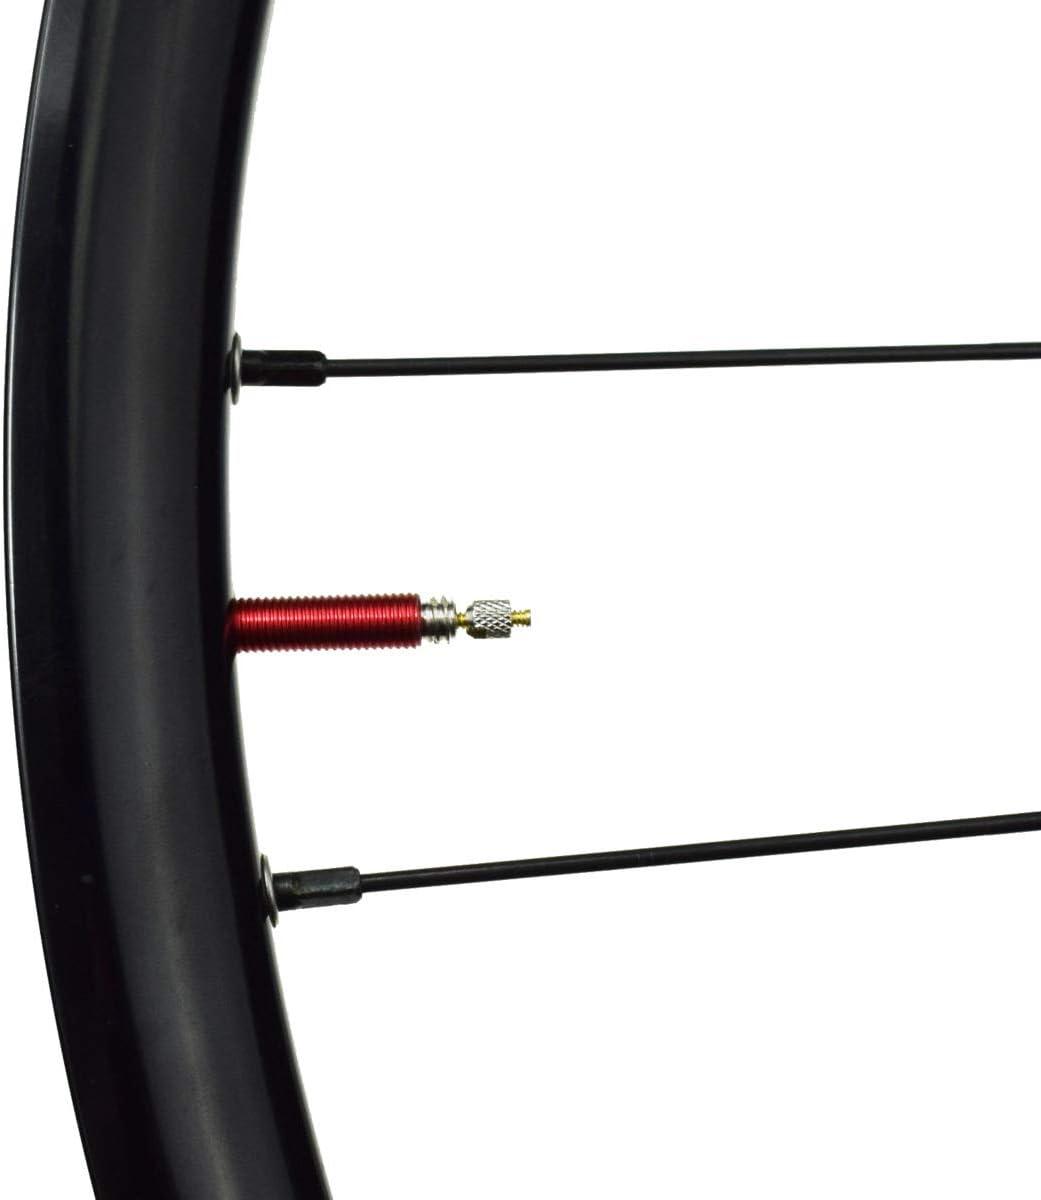 DRIFT MANIAC Bicycle Tubeless Presta Valve Caps